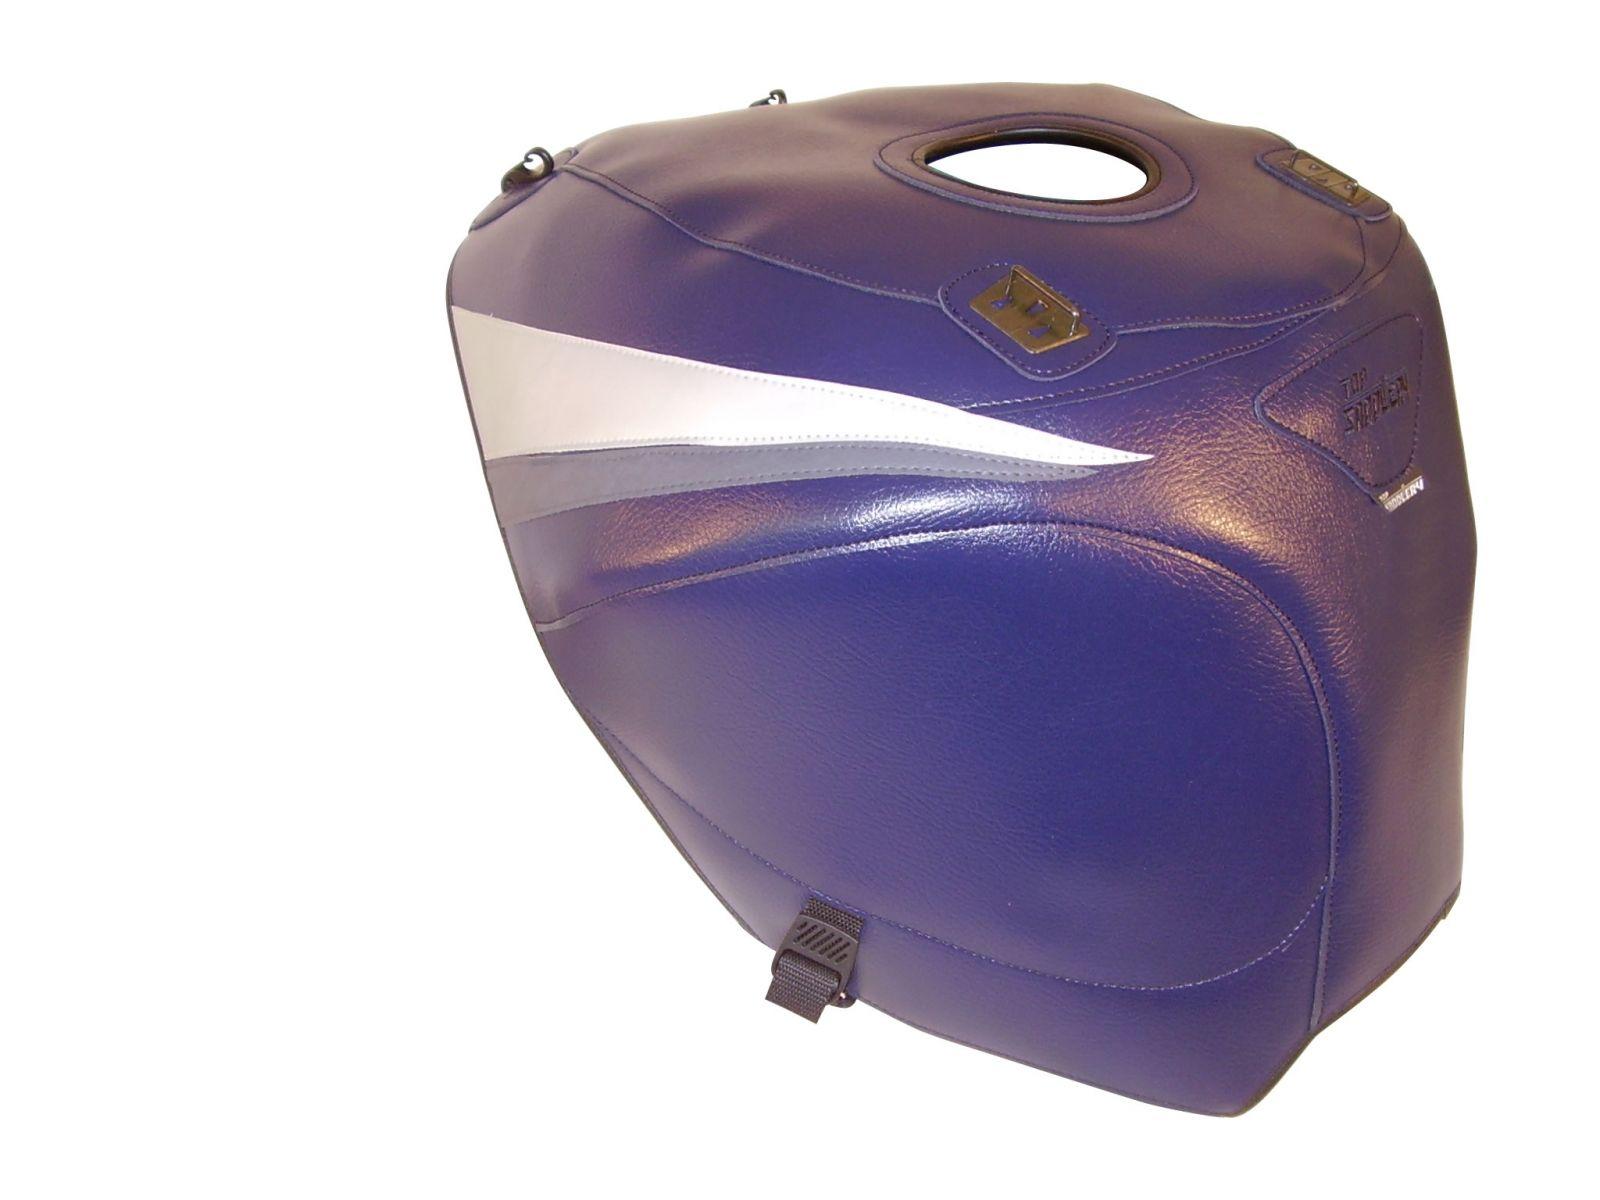 Tapis protège-réservoir TPR3922 - SUZUKI GSX-R 1300 HAYABUSA [1999-2007]